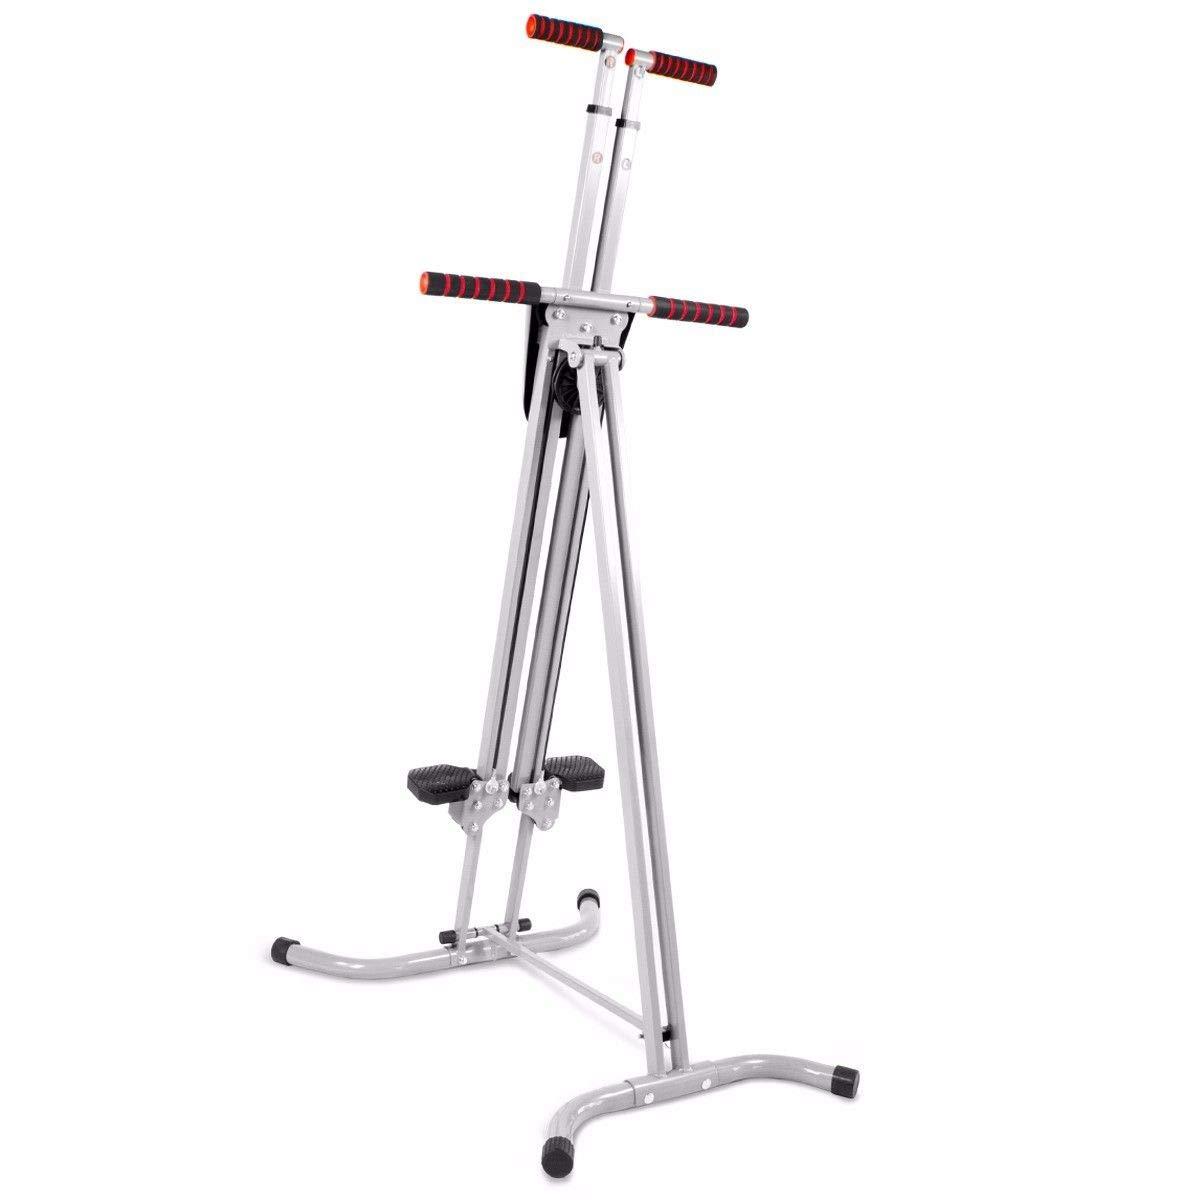 XtremepowerUS Vertical Climber Fitness Cardio Exercise Machine by XtremepowerUS (Image #6)